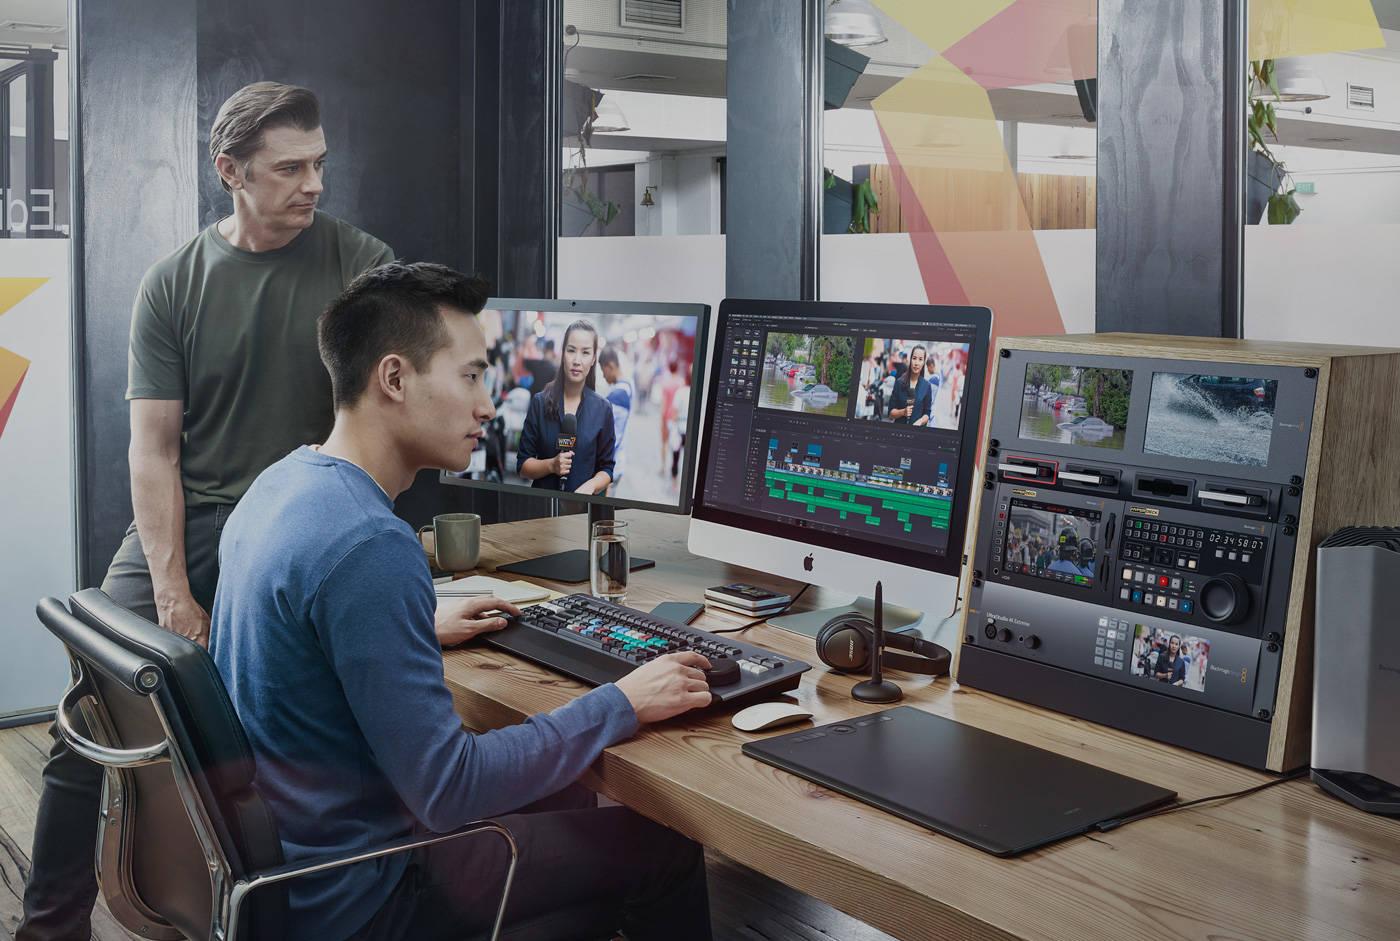 ReeshabhDani007's Setup - The Dream Studio for Gaming and Video Editing | Scooget